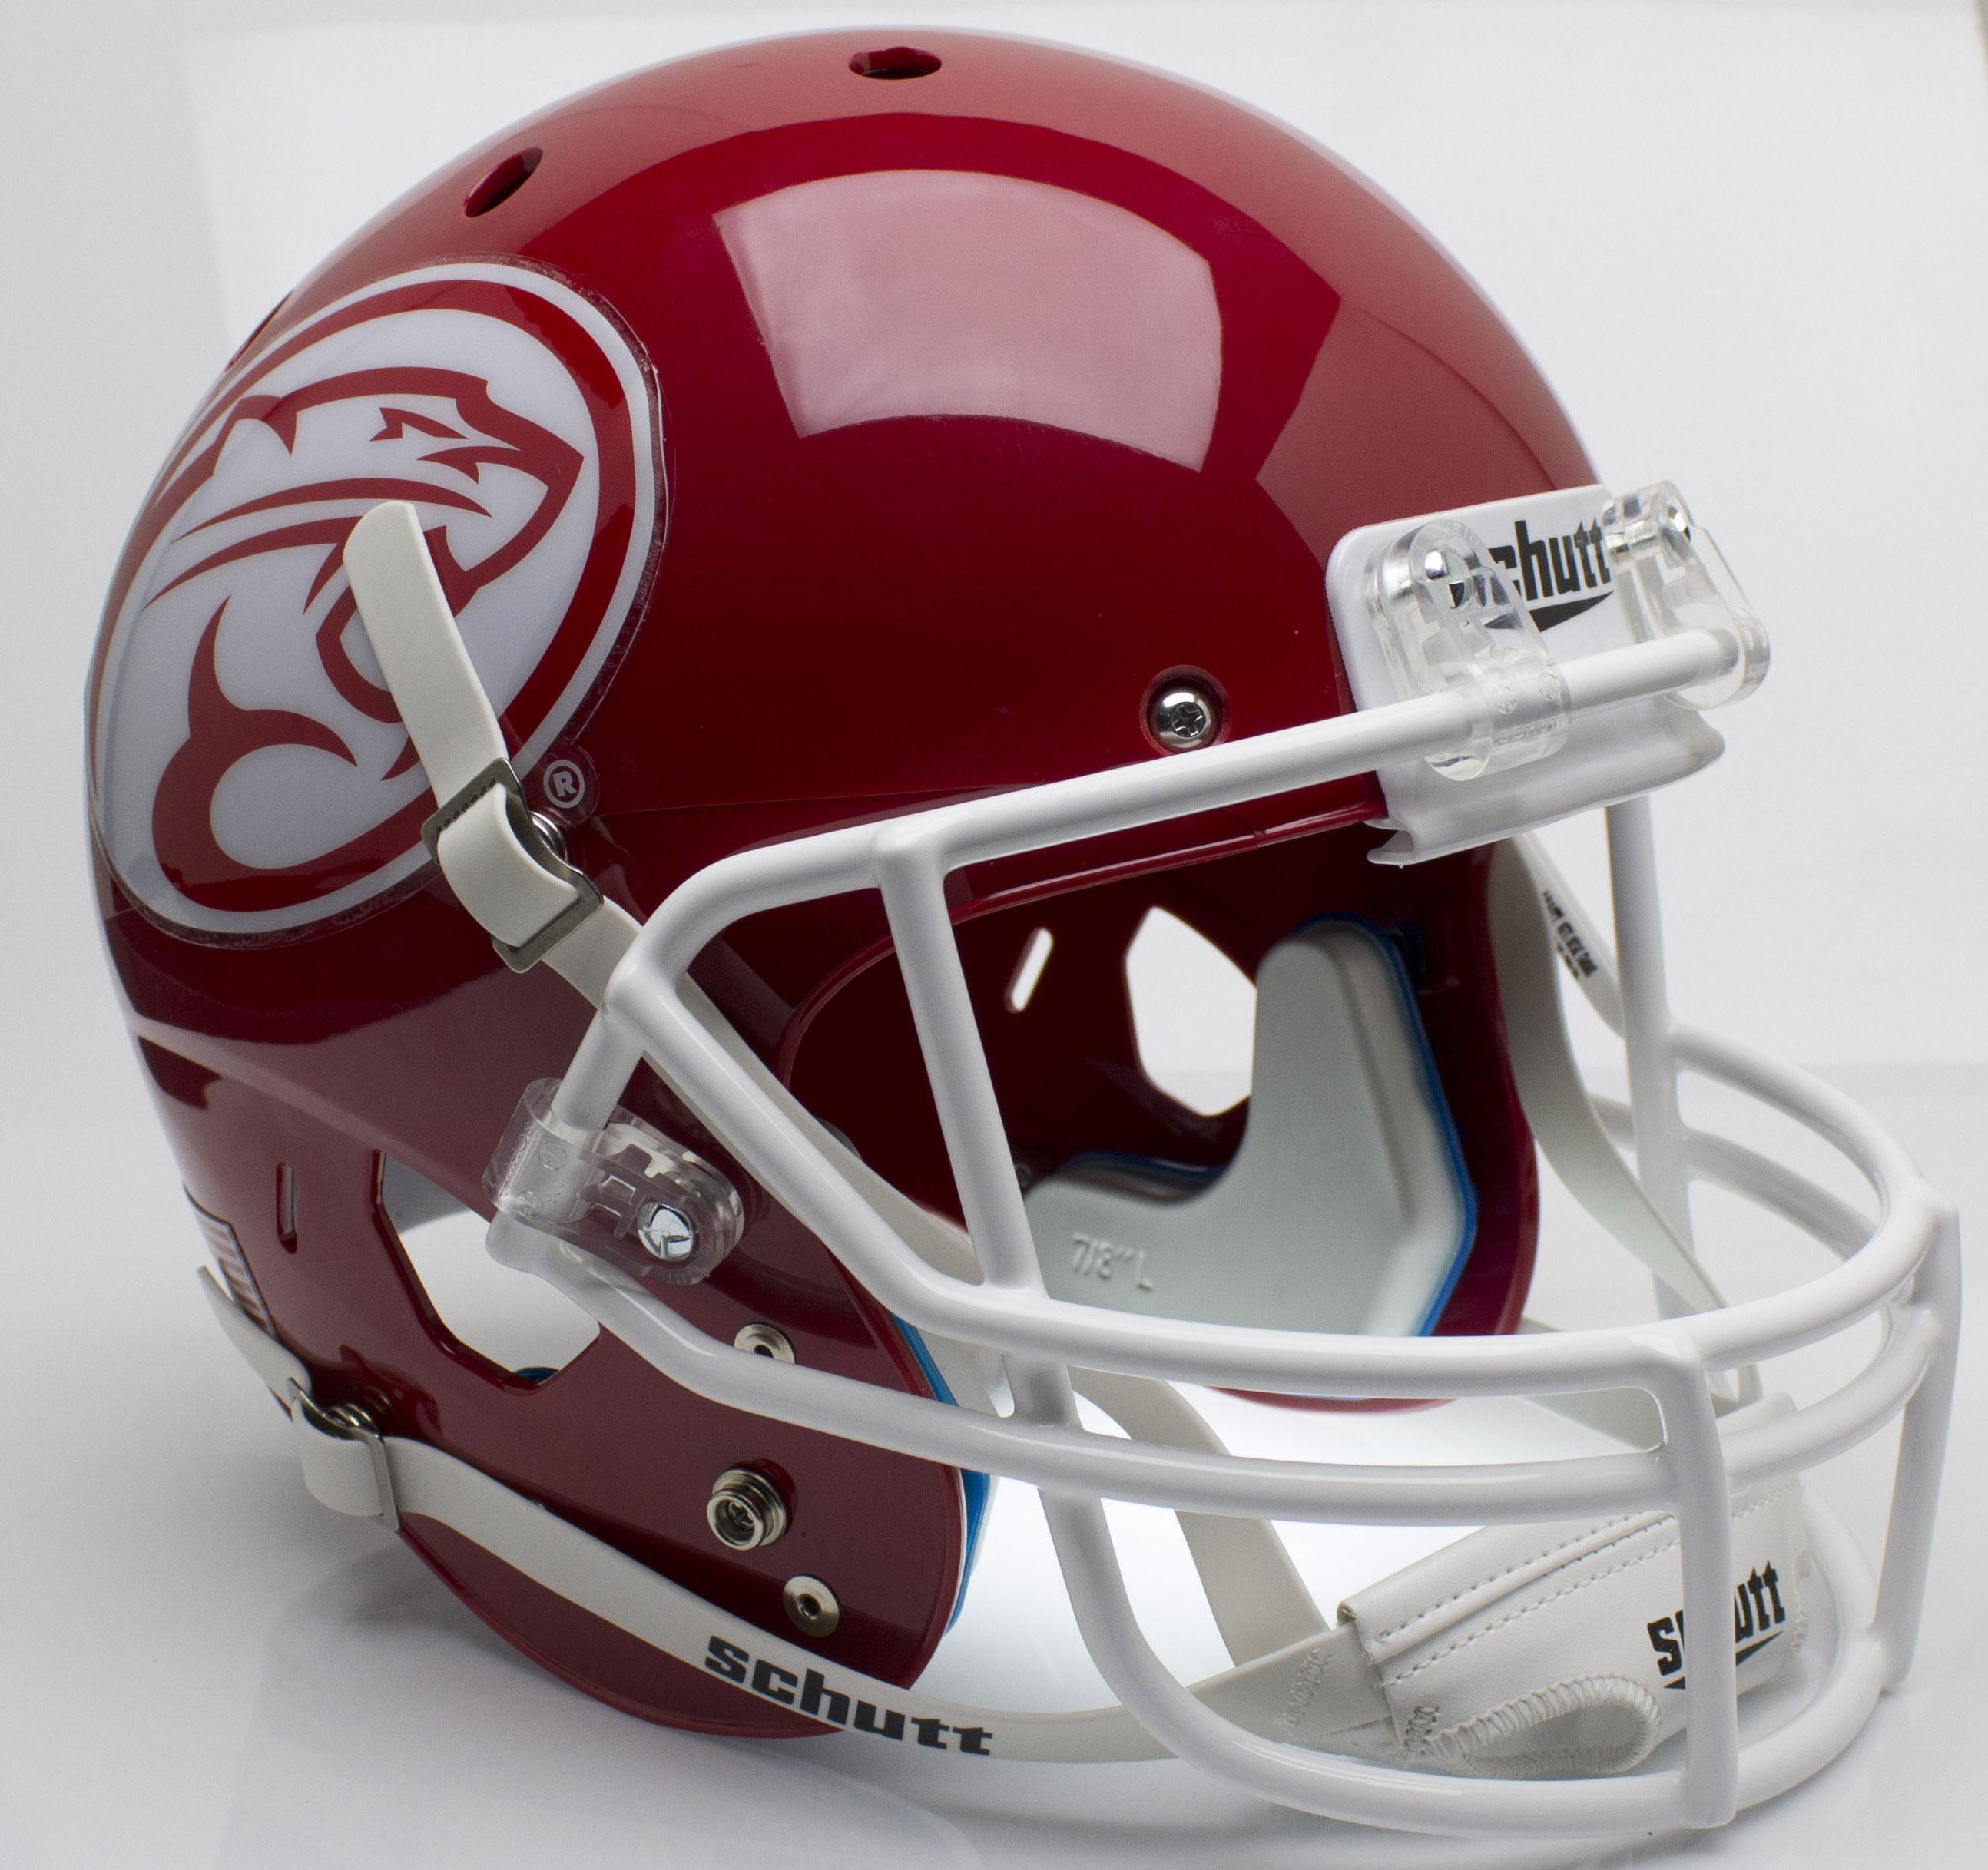 Houston Cougars Full XP Replica Football Helmet Schutt <B>Red</B>